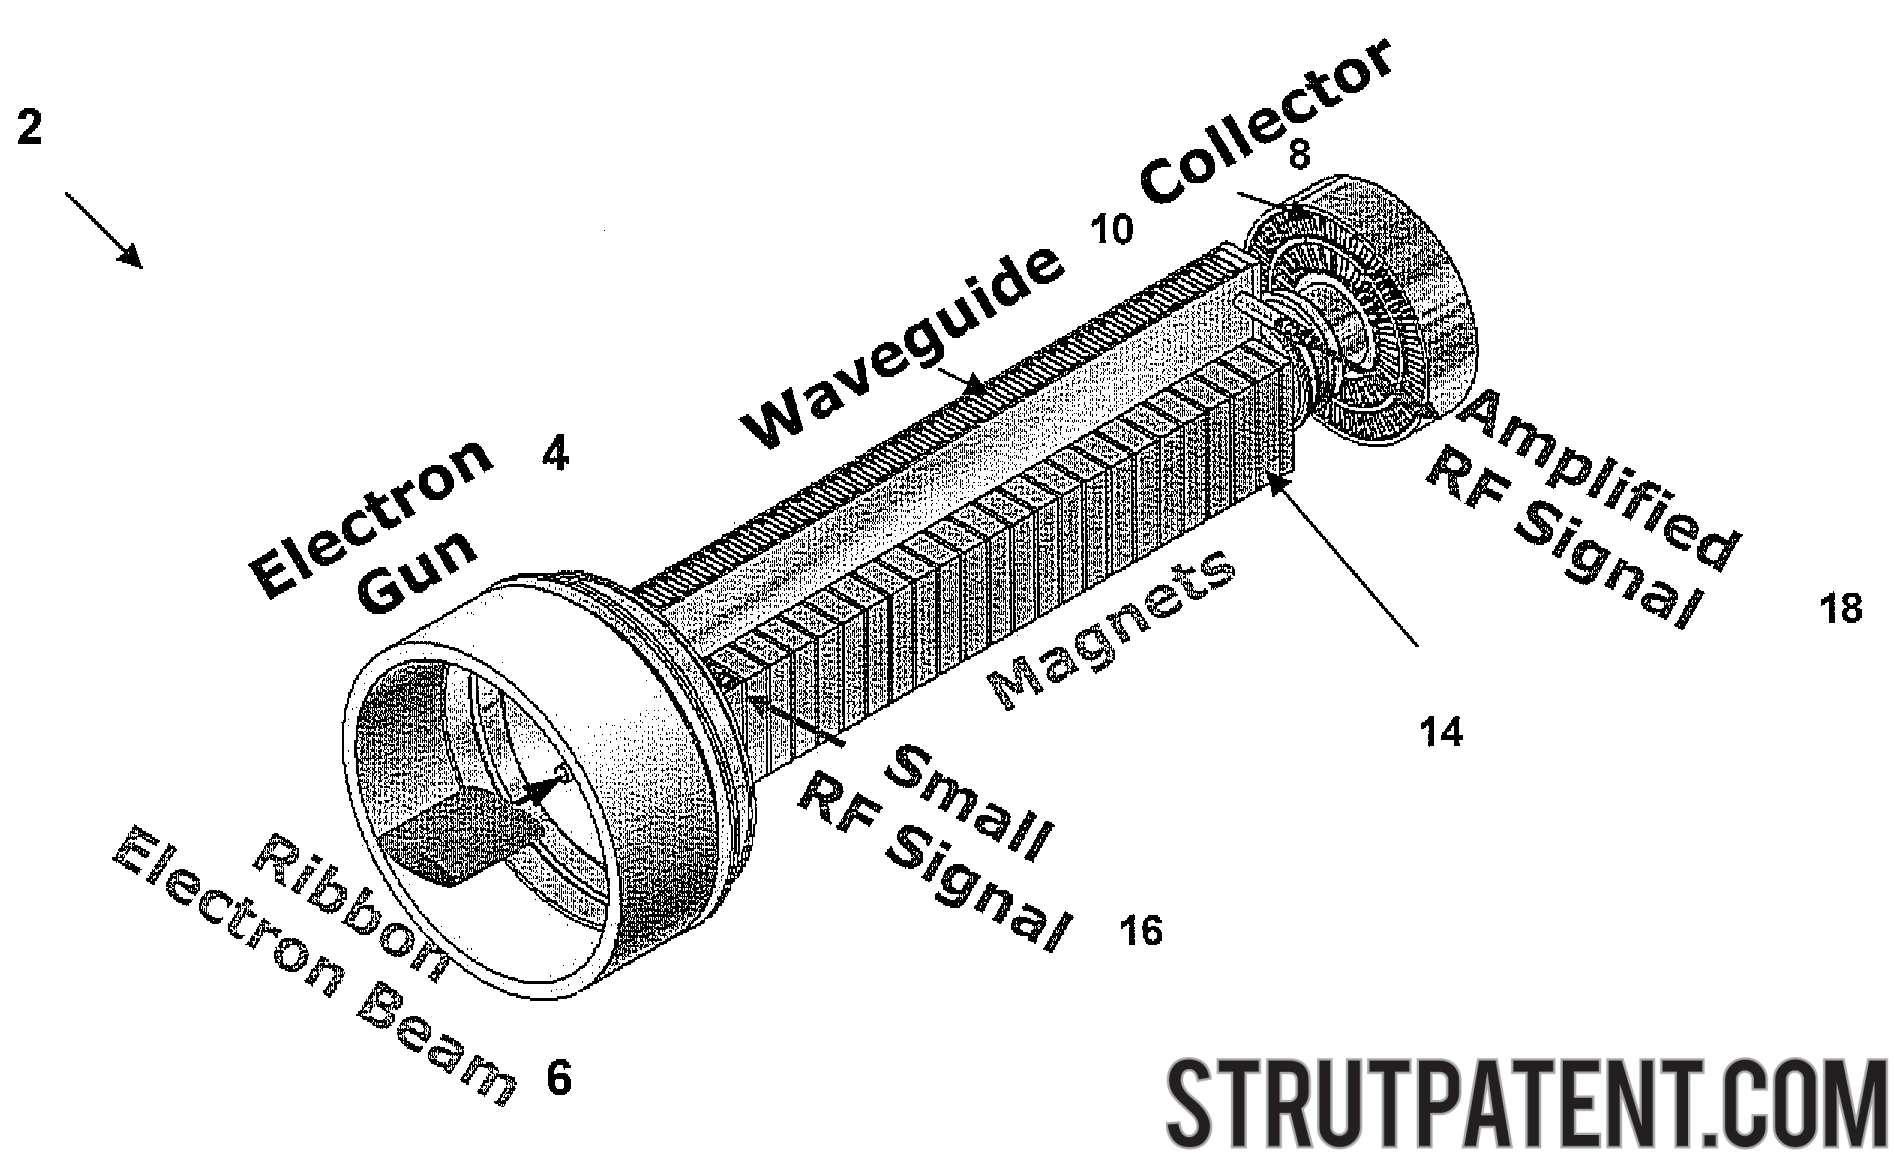 Line 22f1fa19c3m1b7c8e13c9c6d3p27f Magnet Focusing